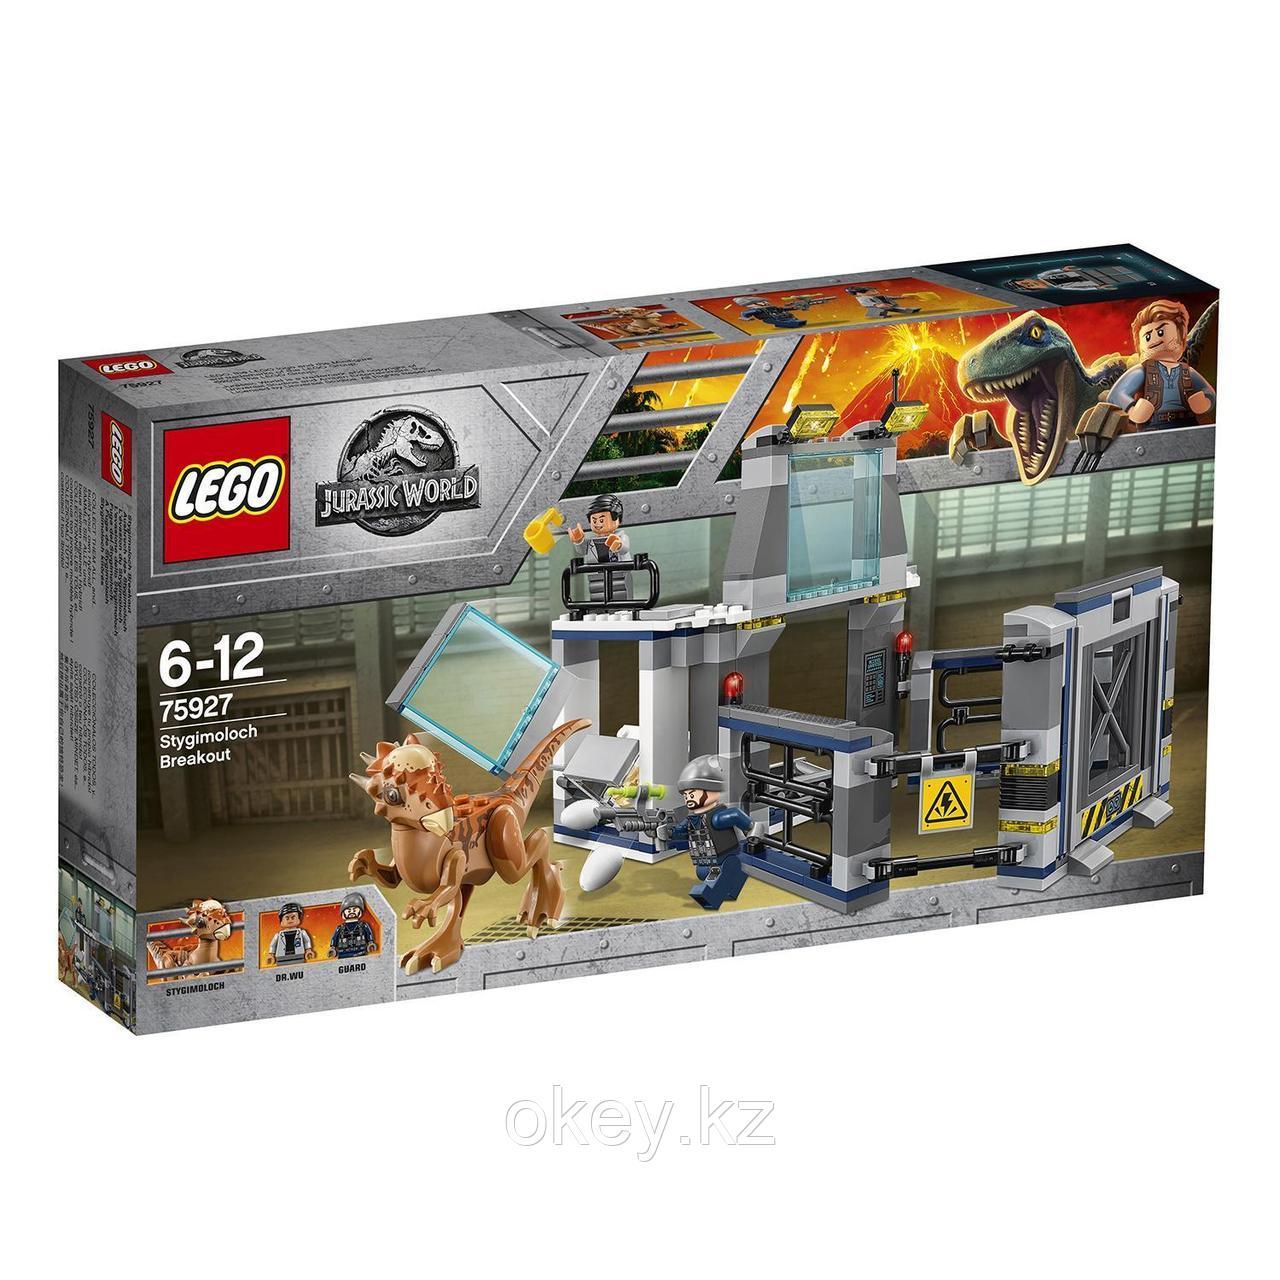 LEGO Jurassic World: Побег стигимолоха из лаборатории 75927